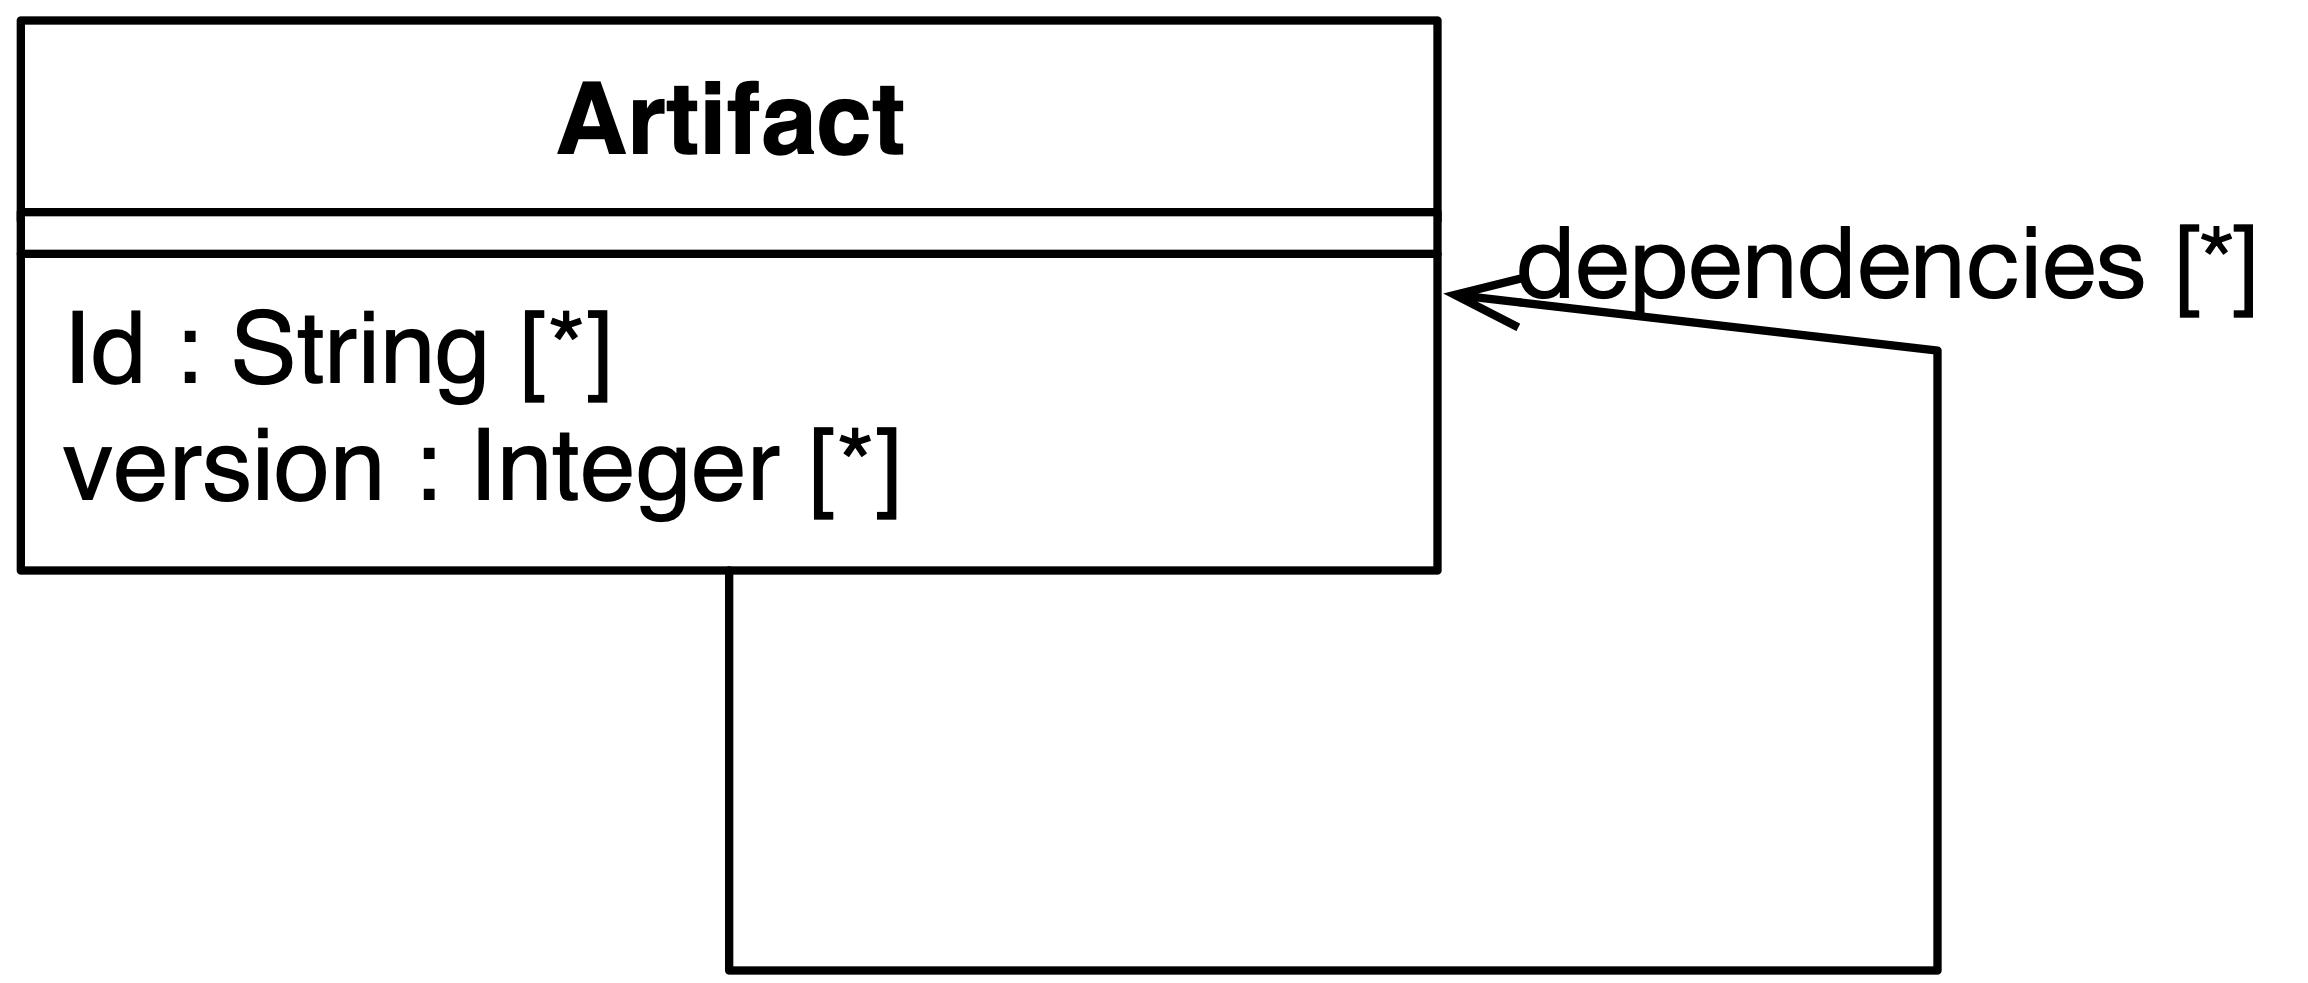 src/images/cd-software-artifact.png